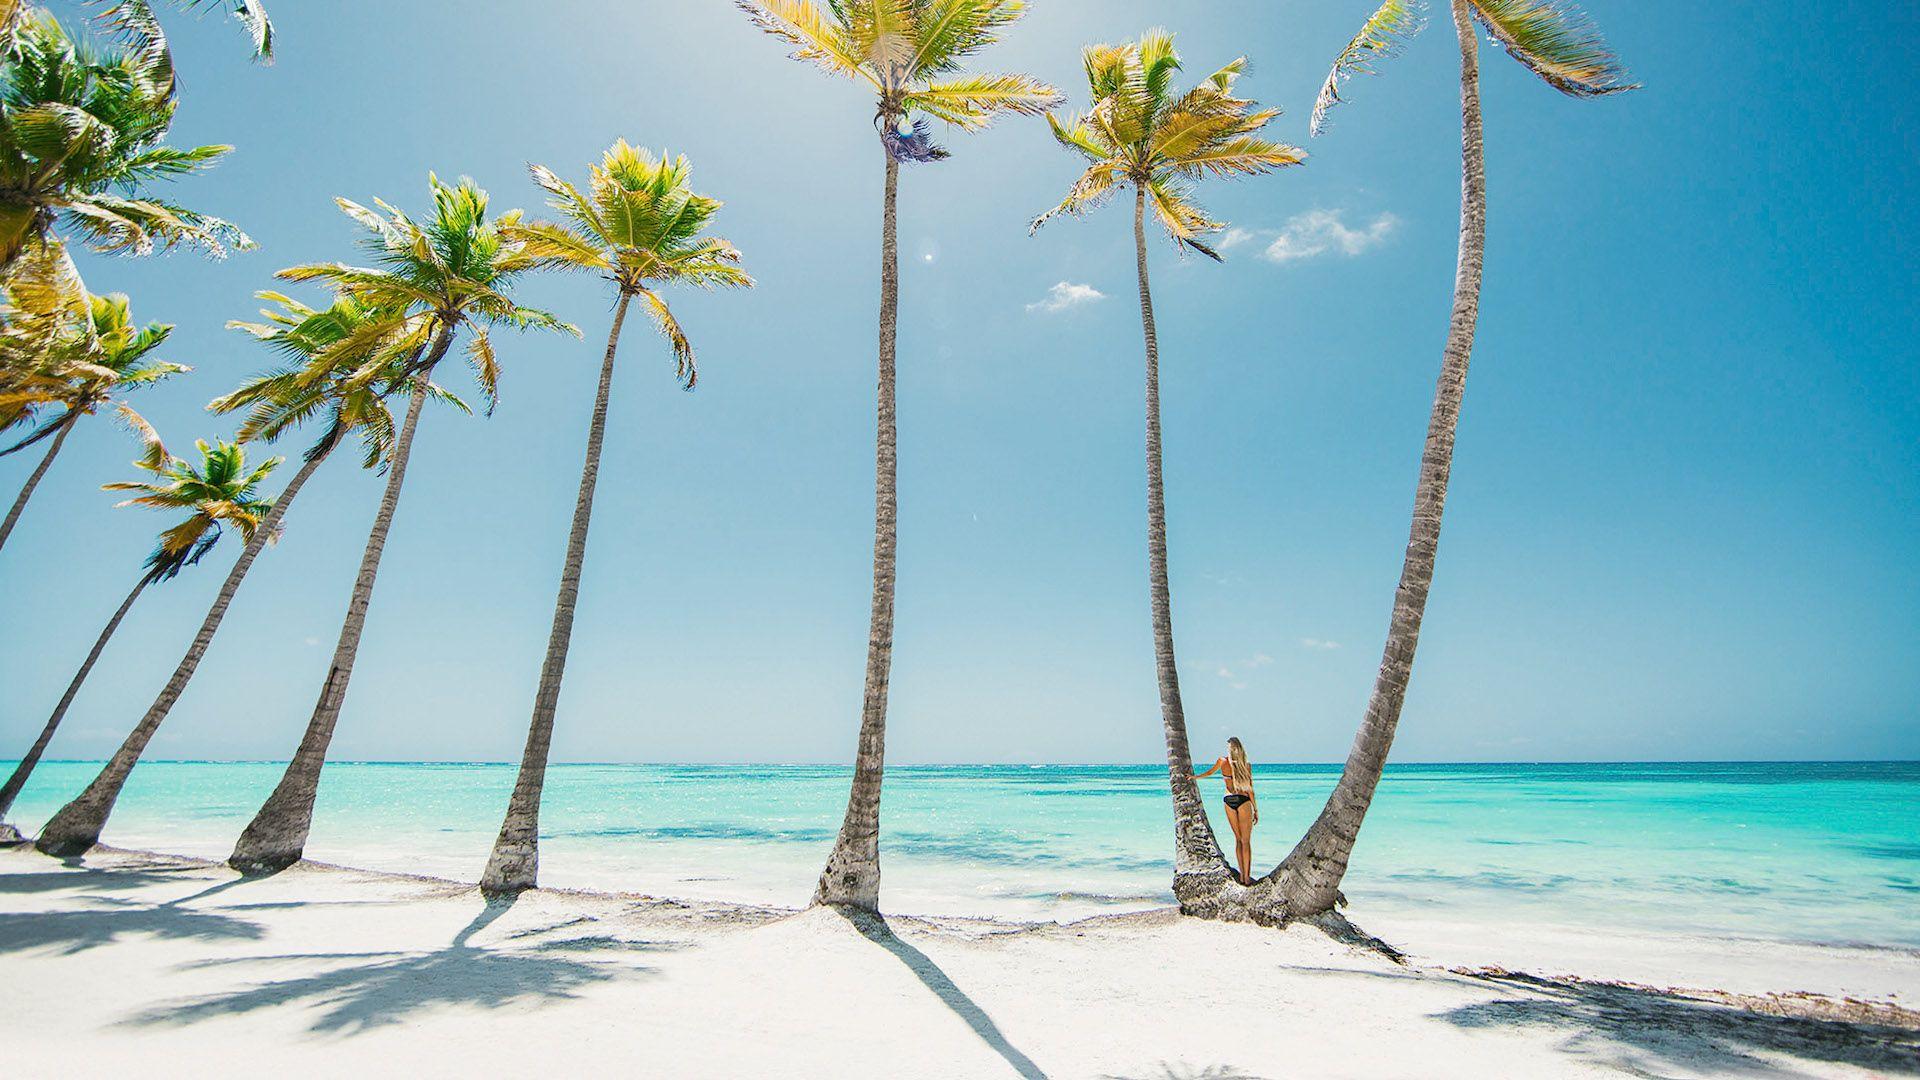 Aerolíneas Argentinas inauguró la ruta Córdoba-Punta Cana